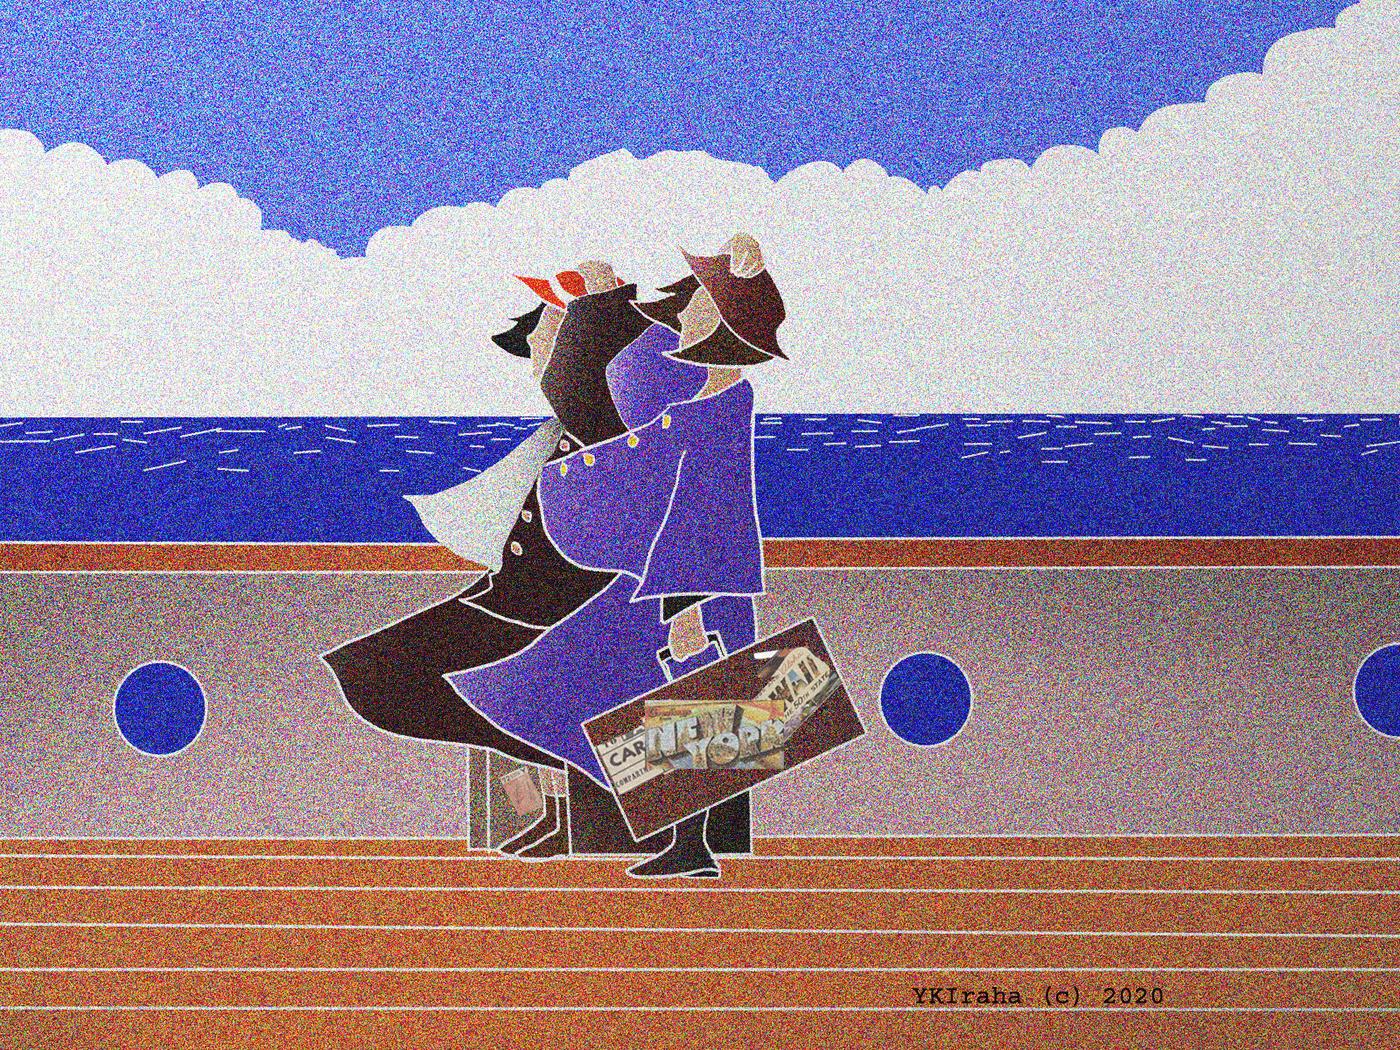 Yukio Kevin Iraha's digital illustration about travelers